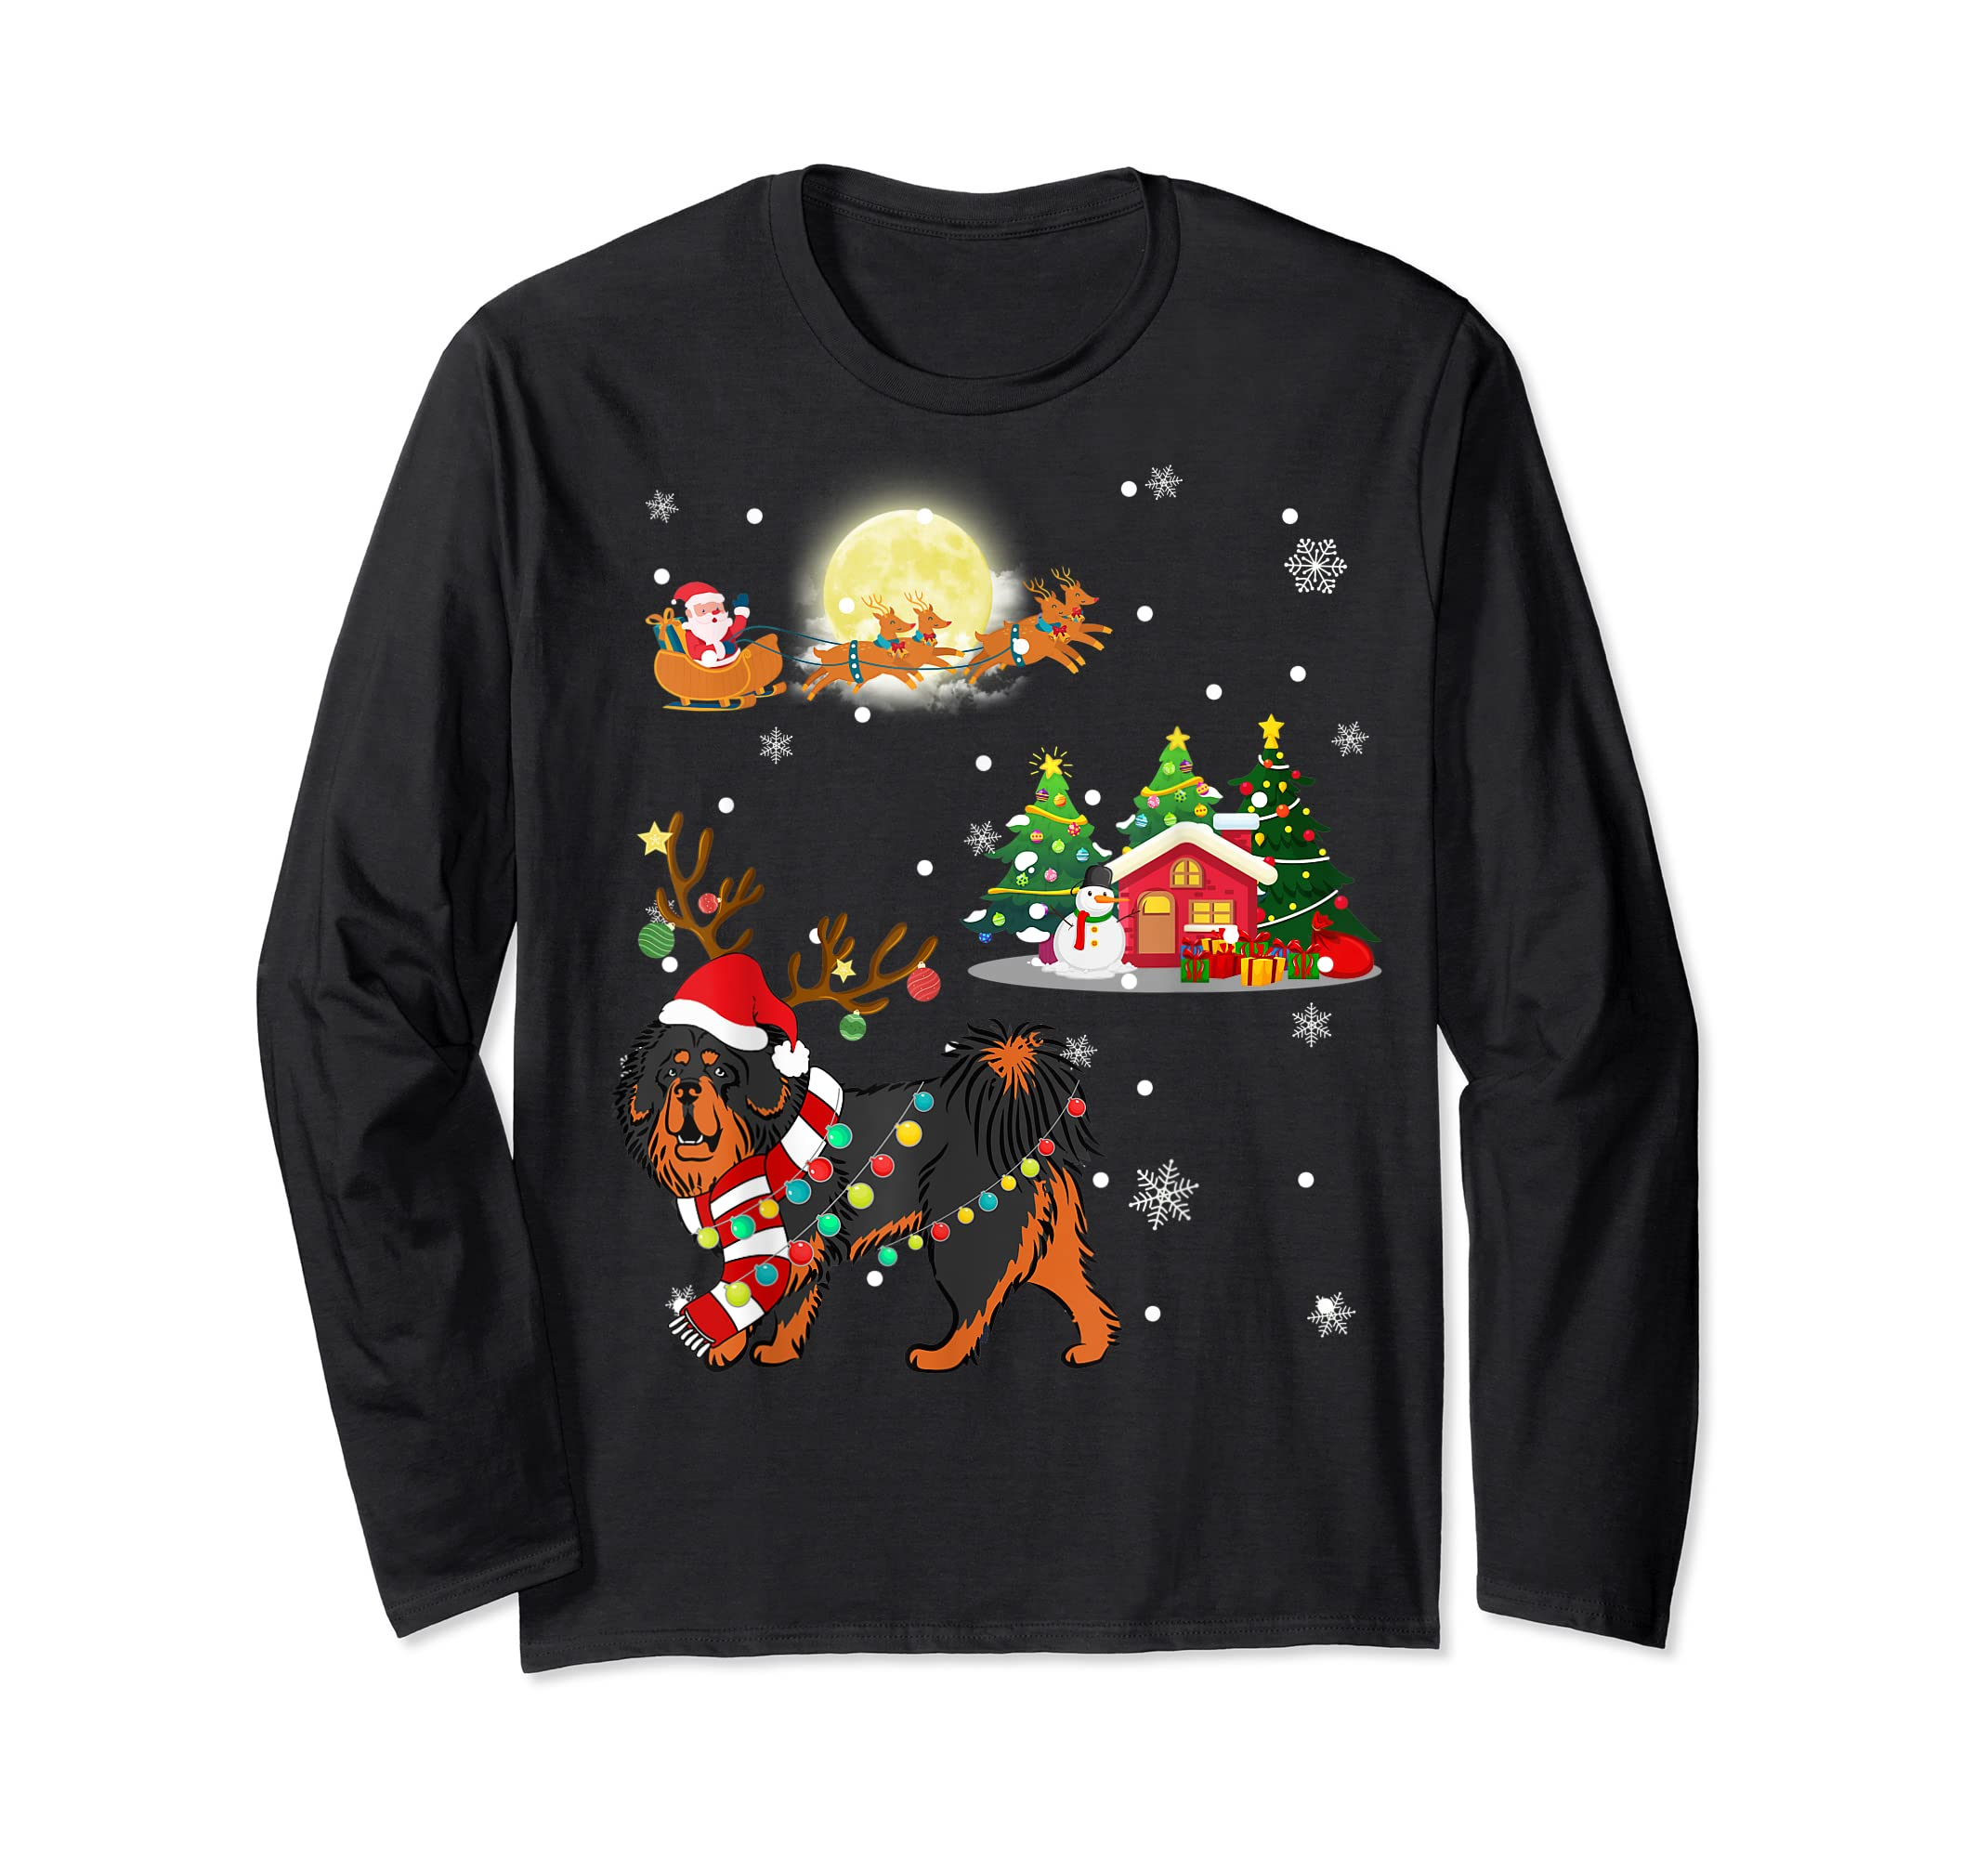 Tibetan Mastiff Dog Led Light Christmas 2019 Gift T-Shirt-Long Sleeve-Black